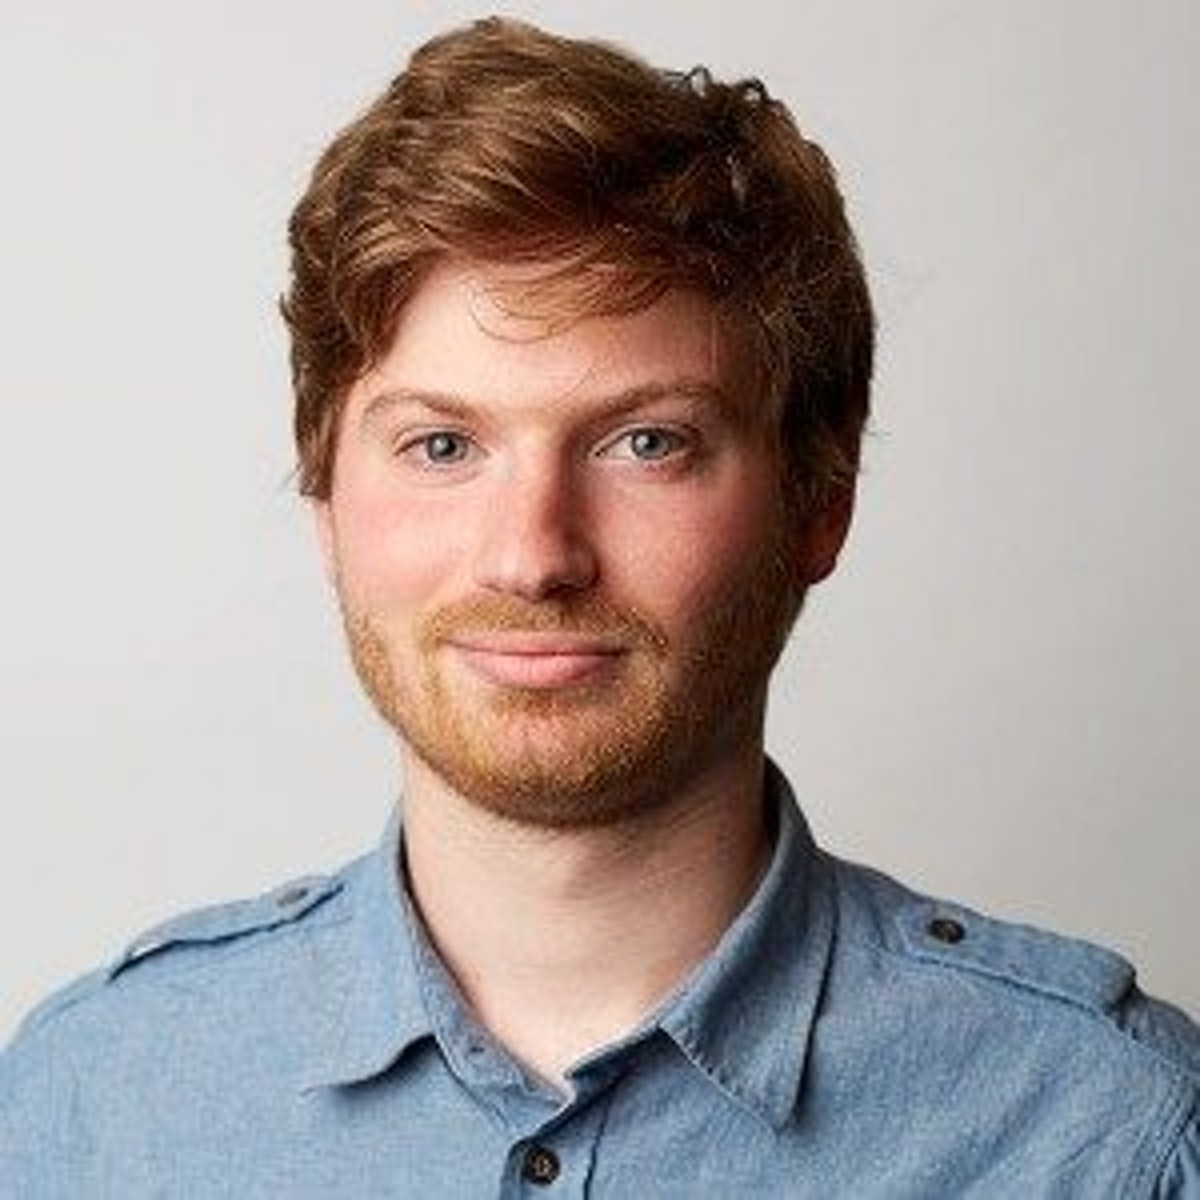 Daniel Tappan